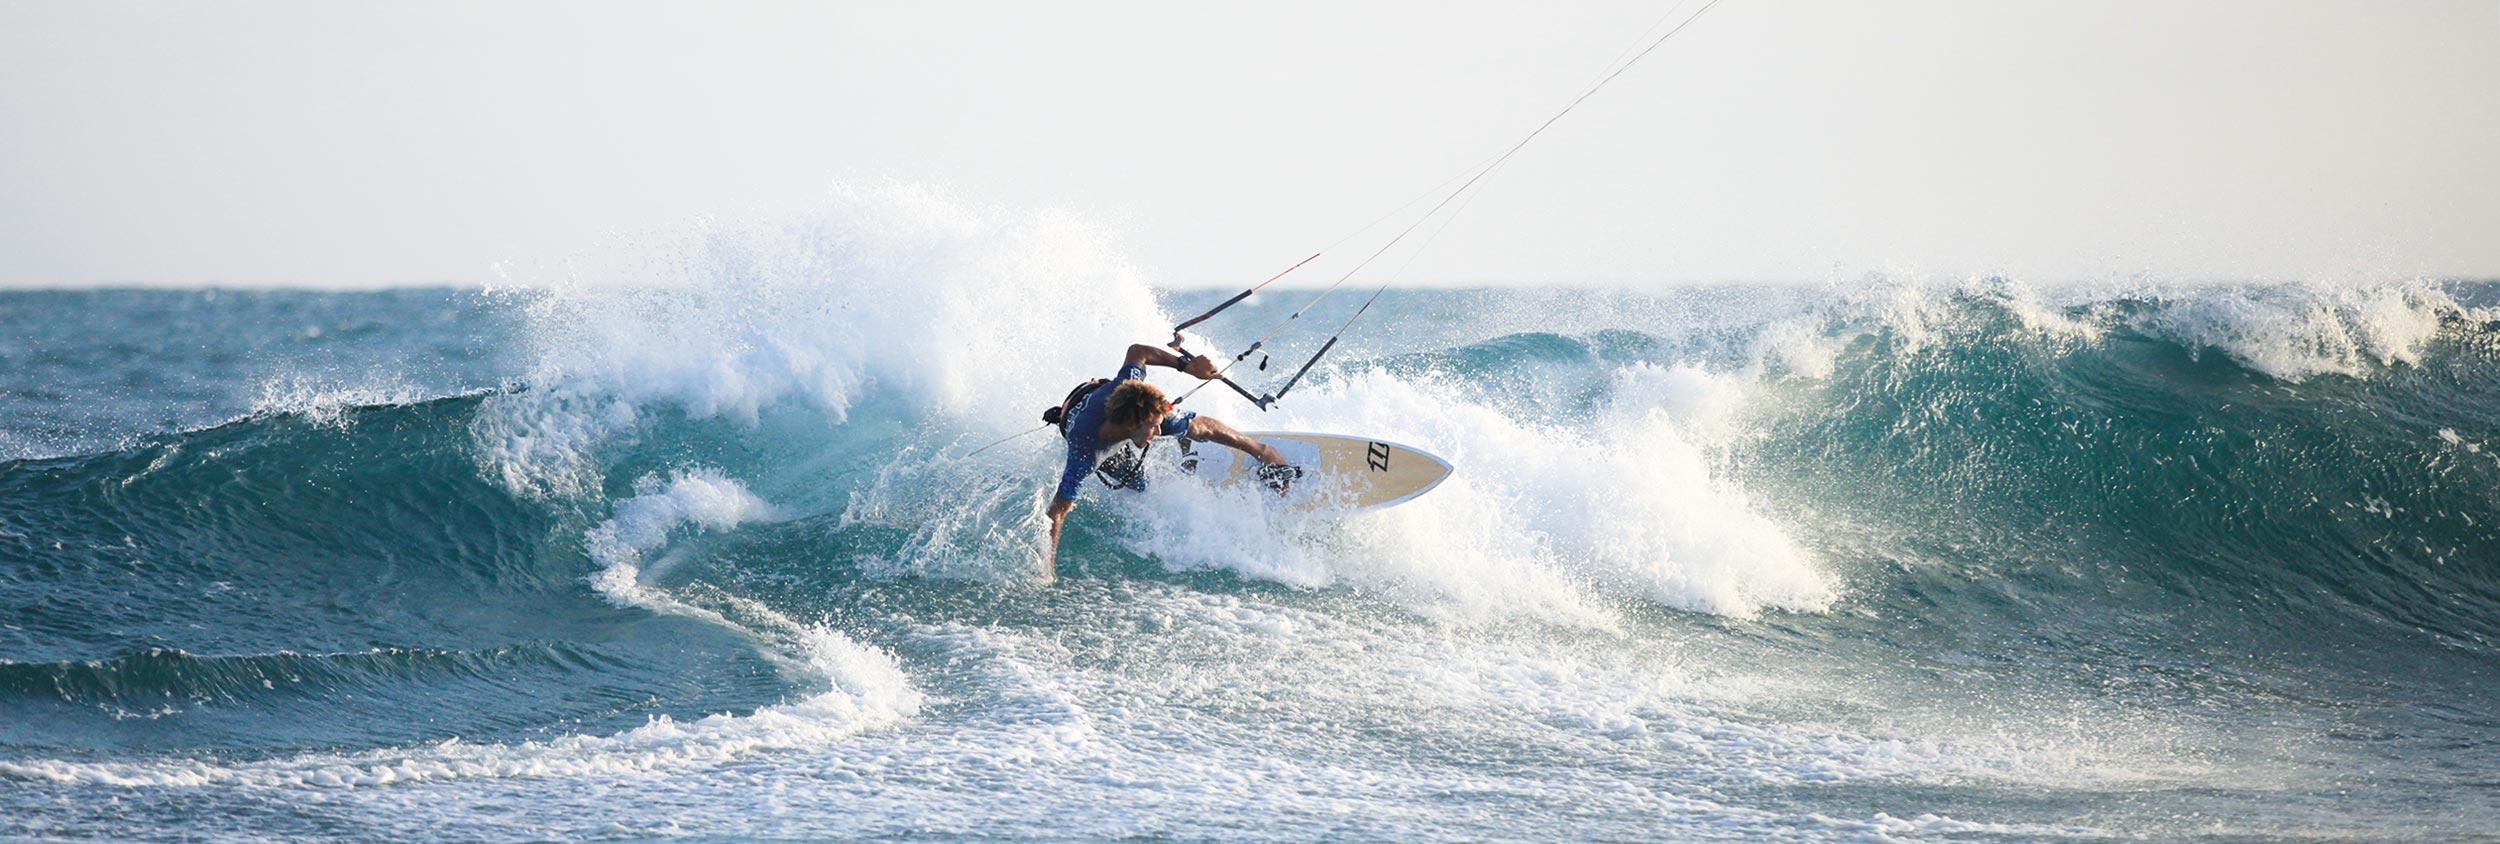 Club Mistral - Sal Cape Verde Kiteworld Kitesurfing